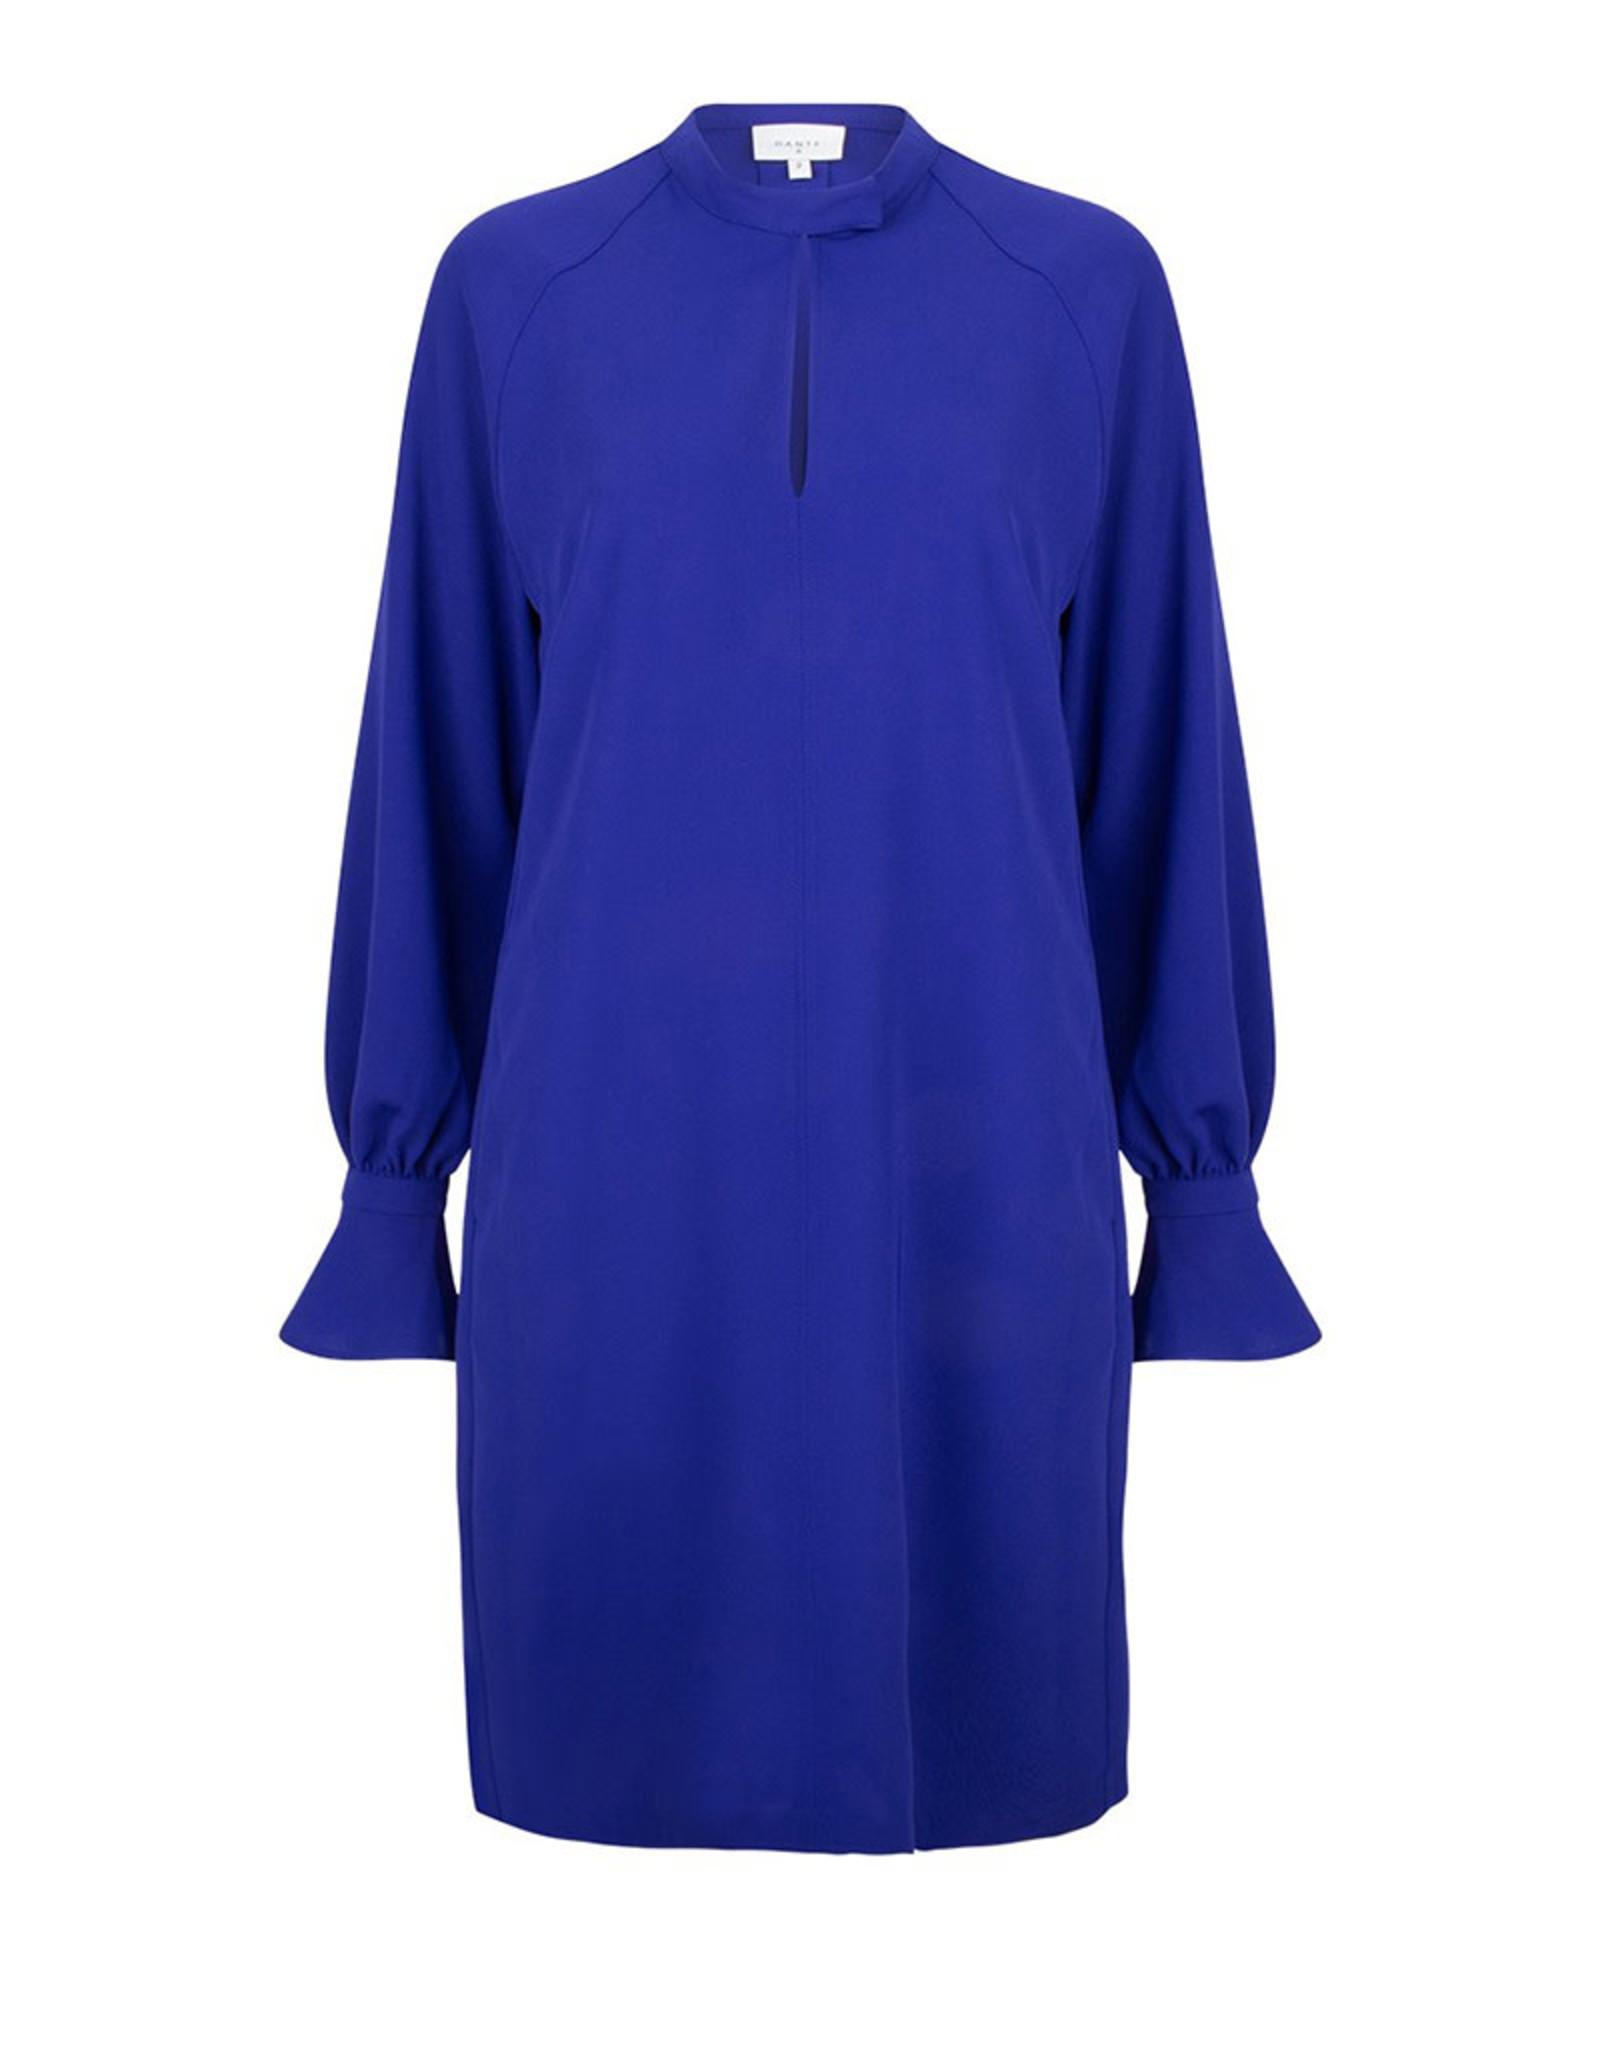 dante6 Celsha High collar jurk